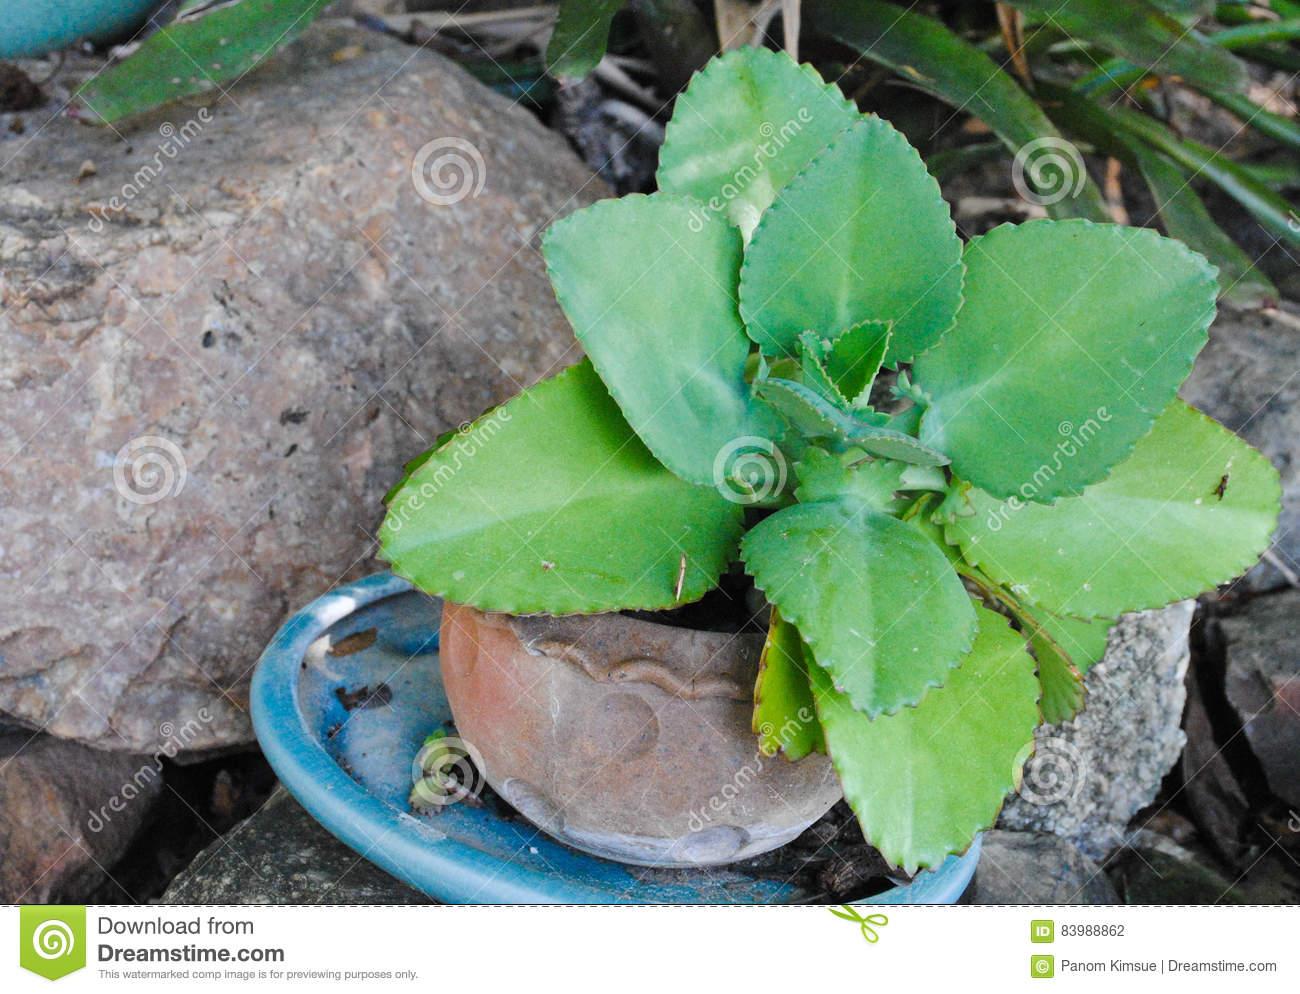 Kalanchoe Pinnata Or Crassulaceae Or Bryophyllum Daigremontiana.